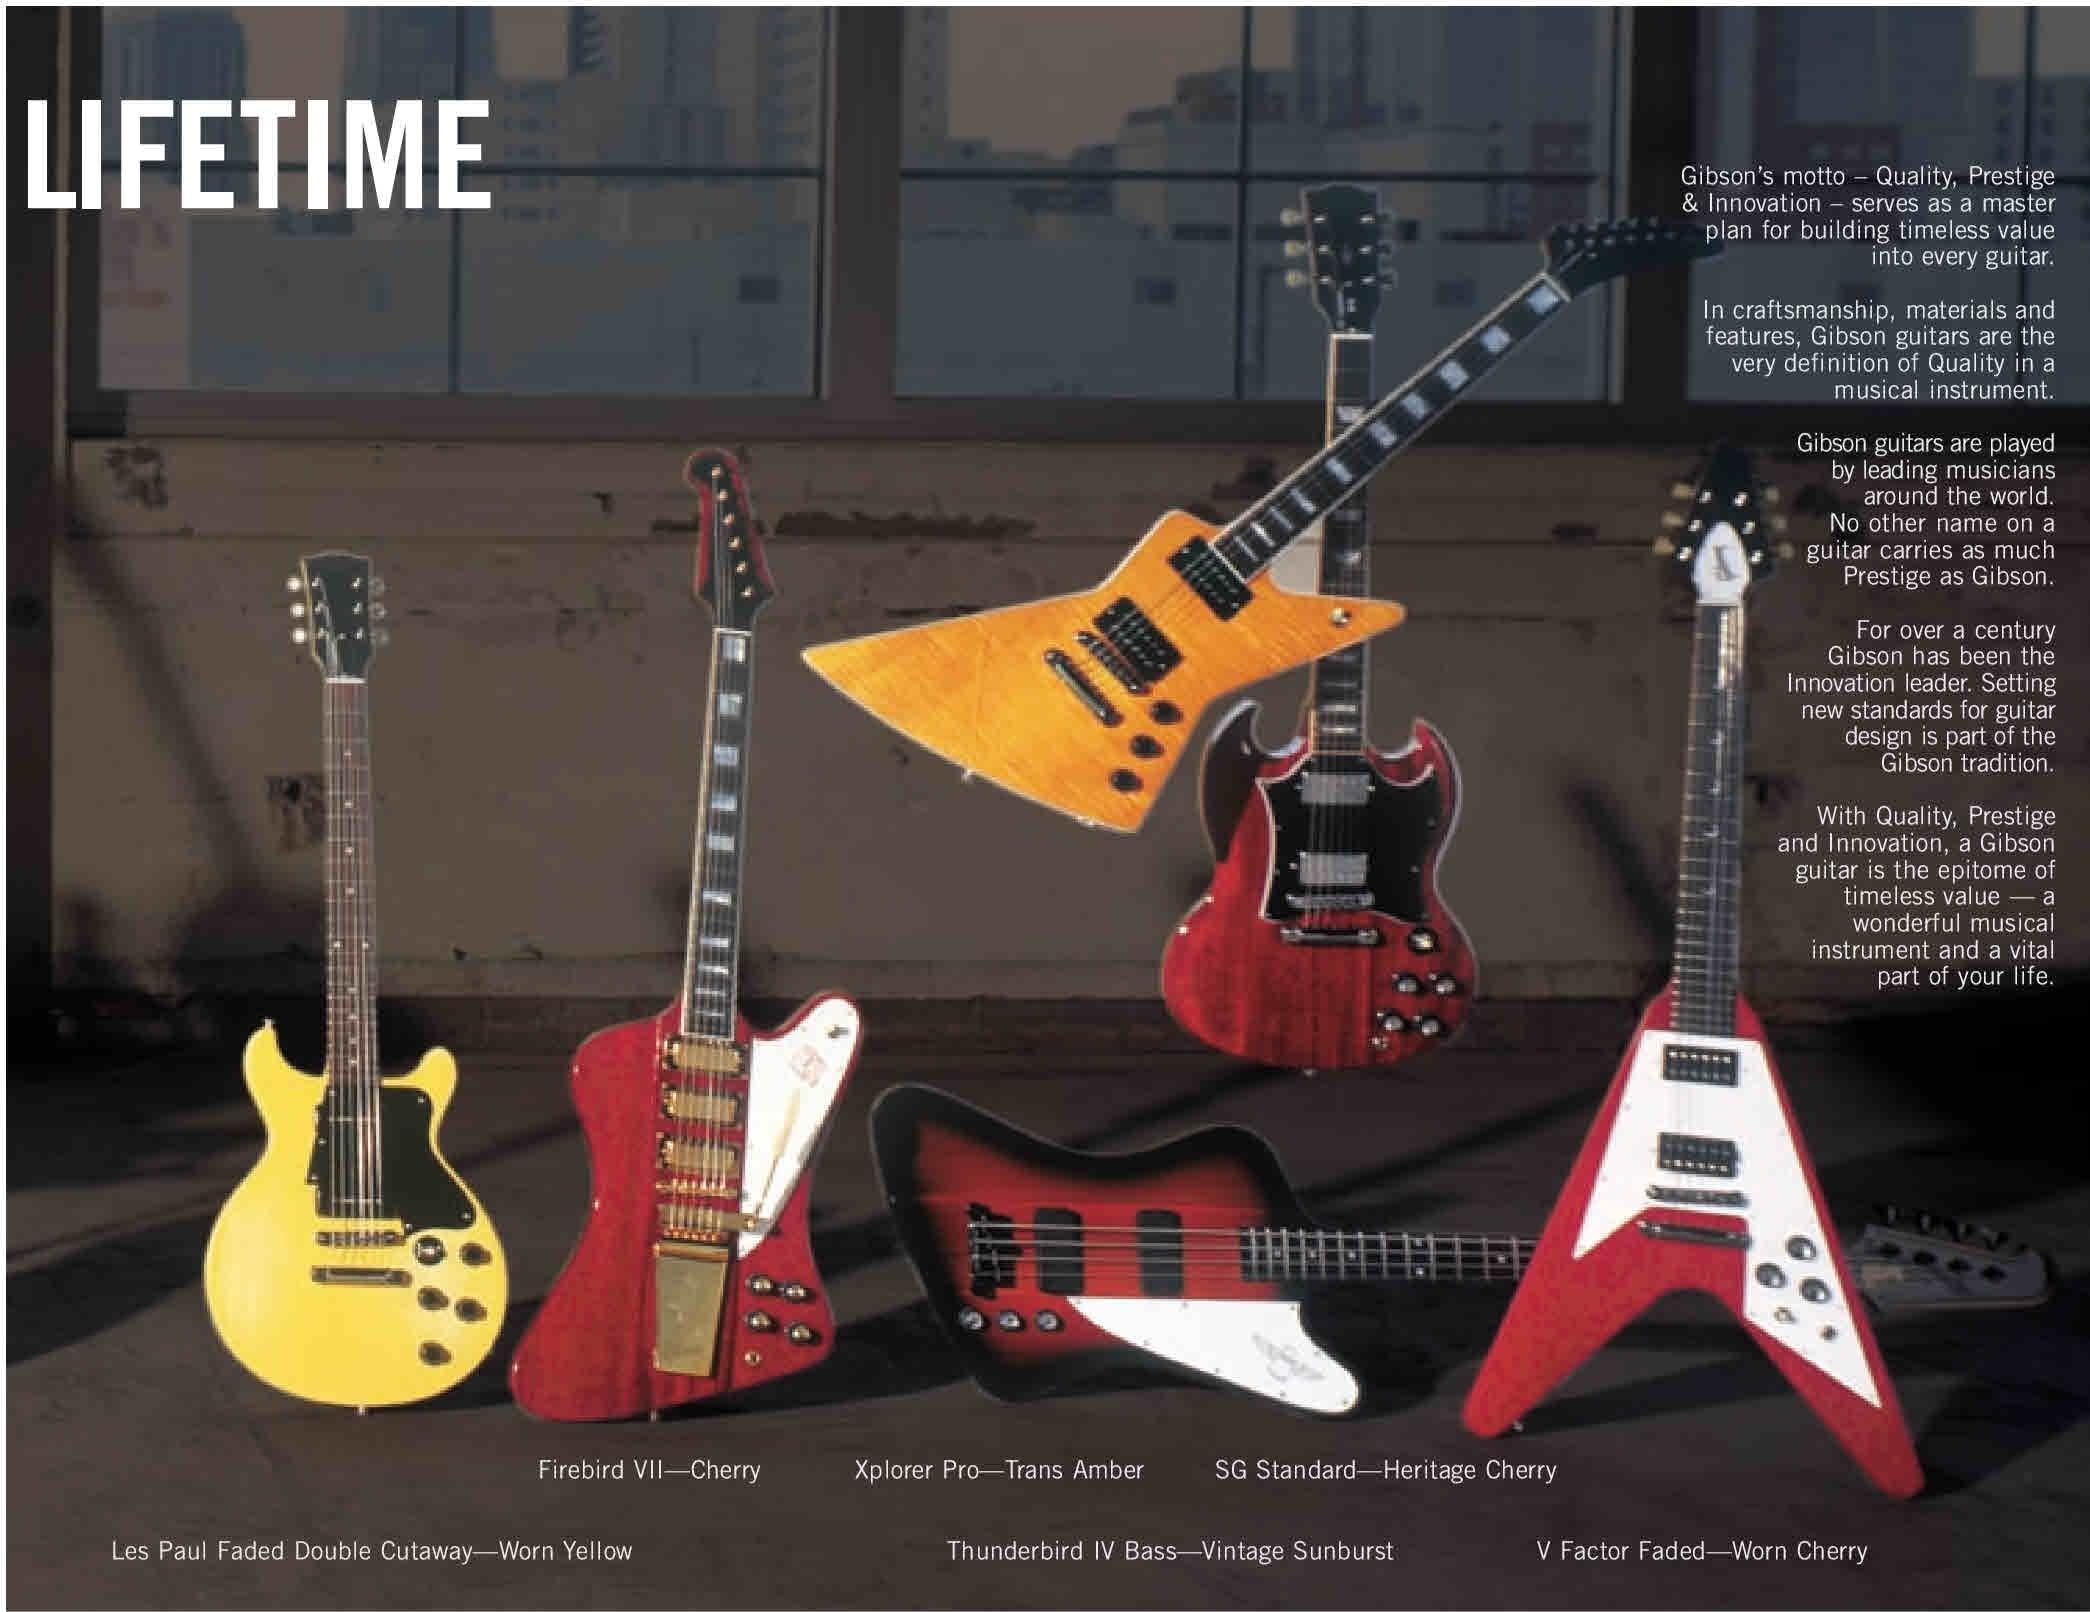 Gibson L 5 Wiring Diagram Trusted Diagrams Thunderbird Firebird Vii All Kind Of U2022 Bass